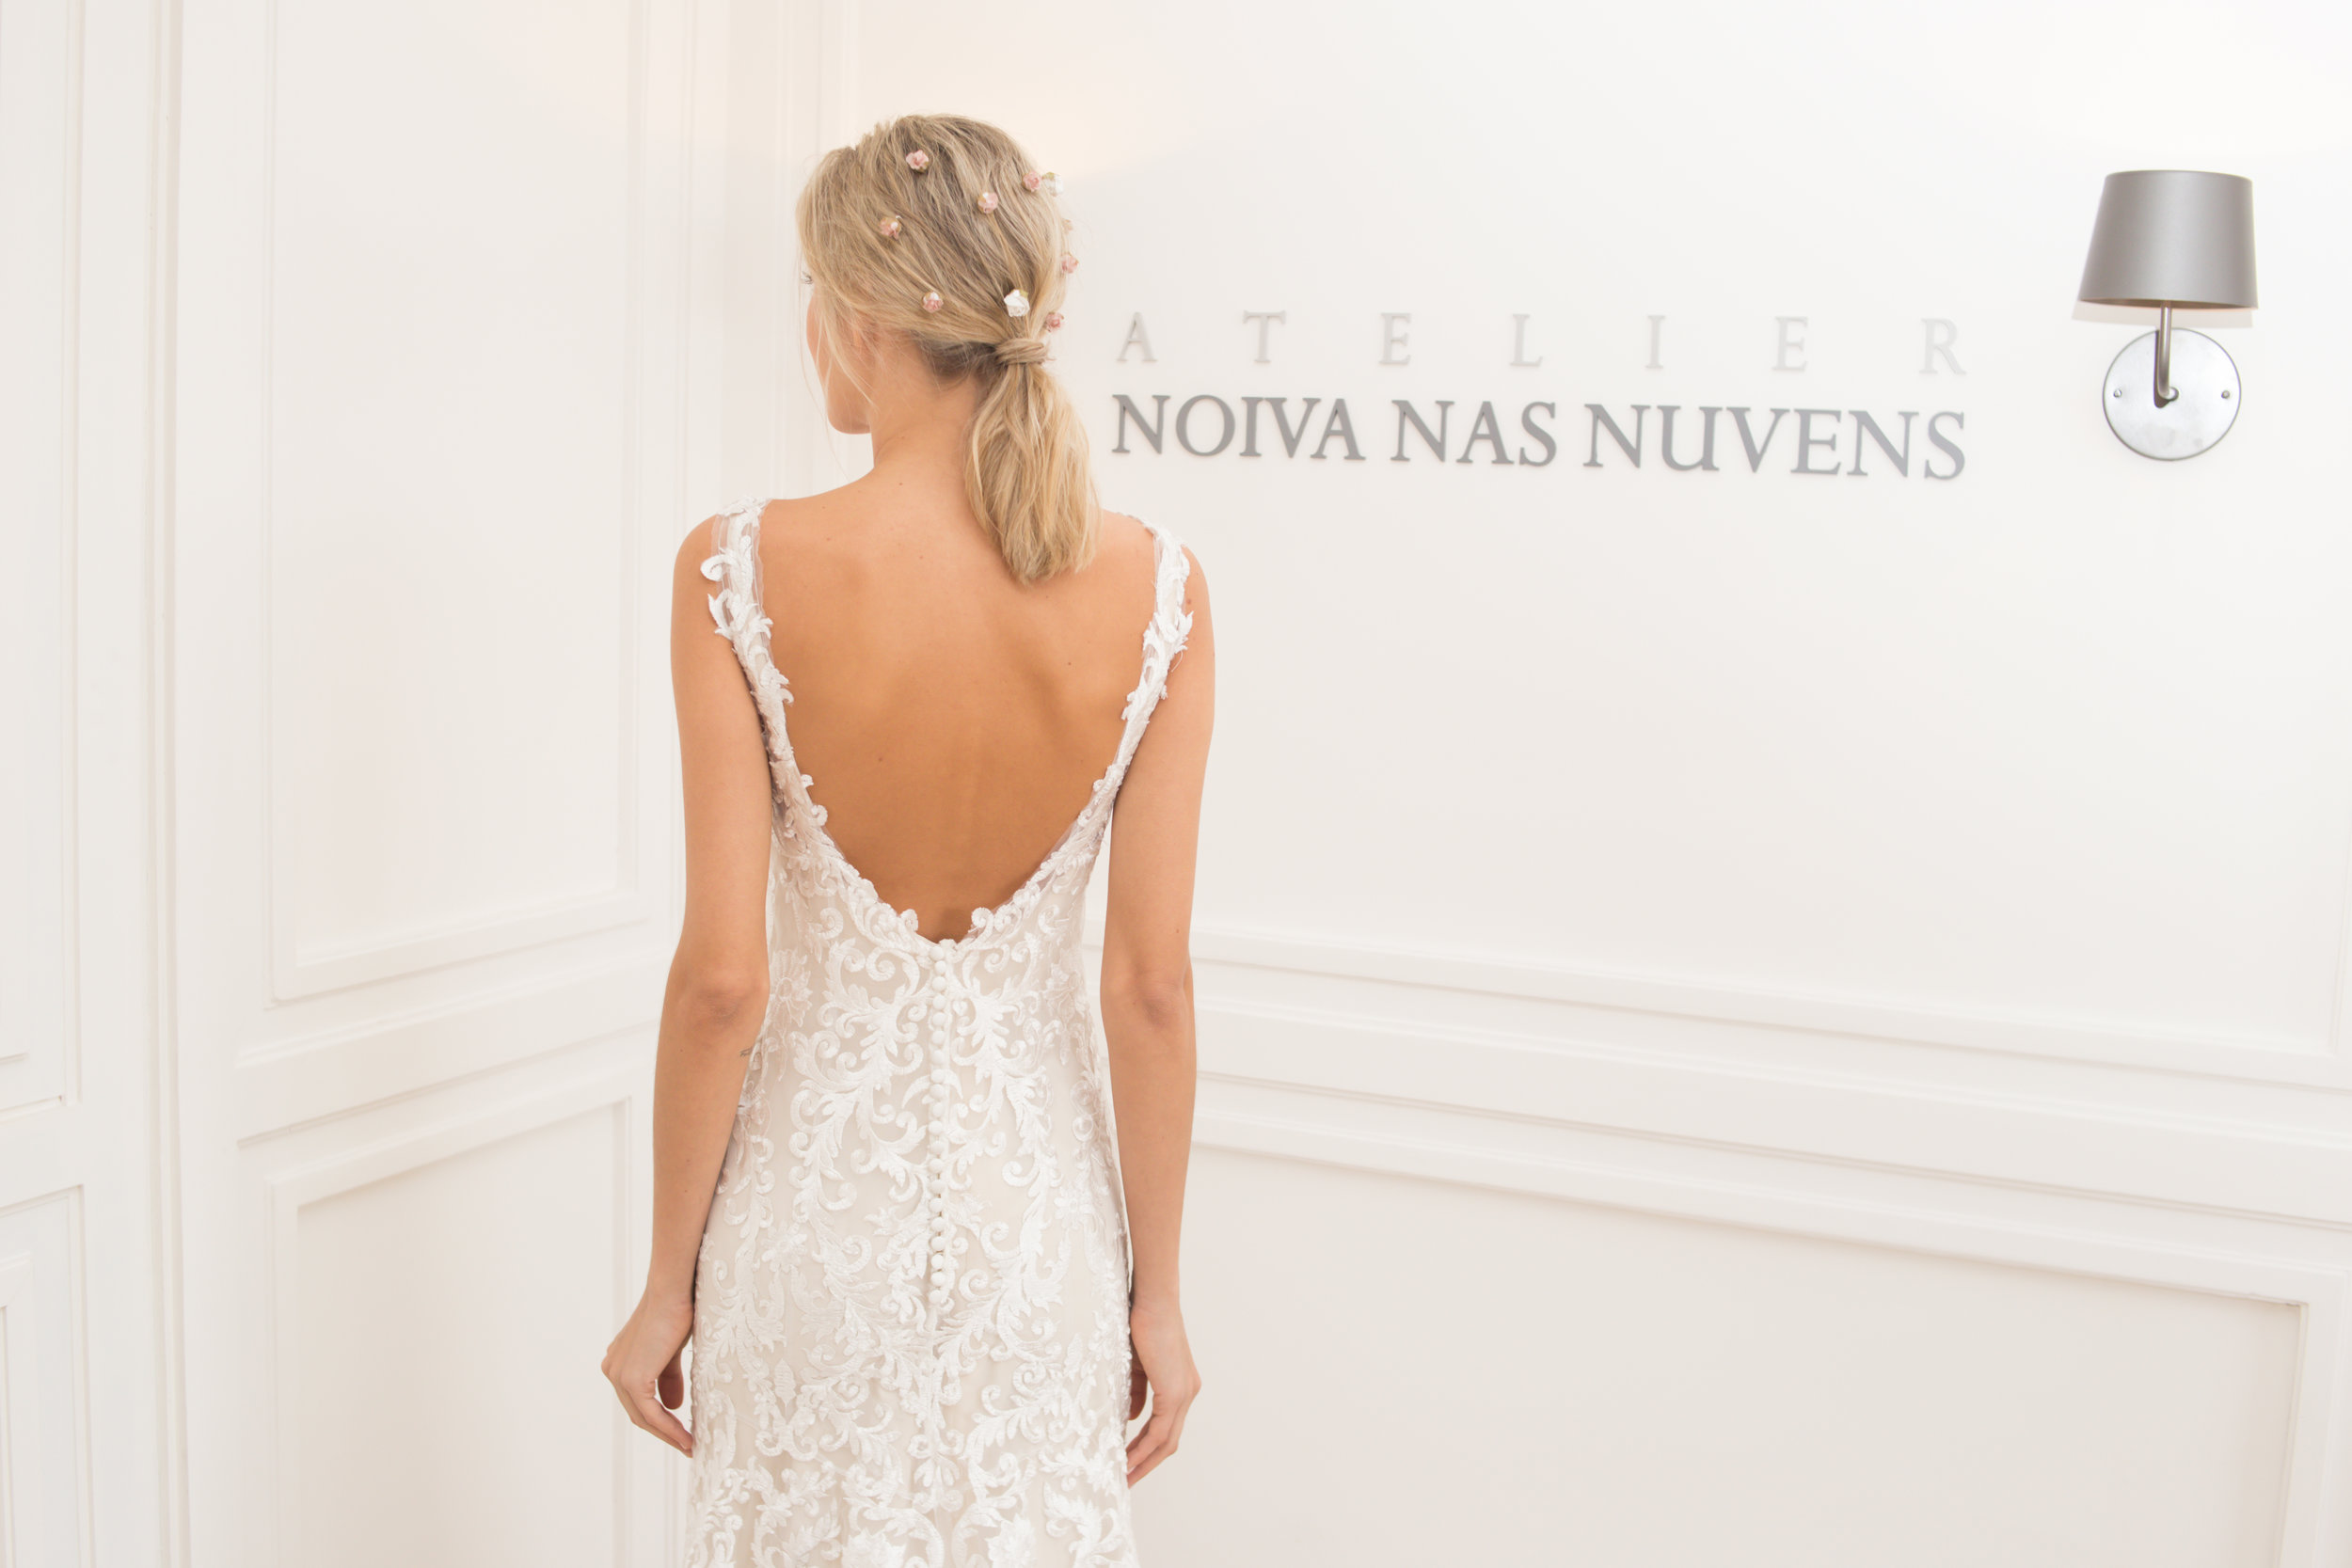 Antonela Costas detalhe_natural.jpg